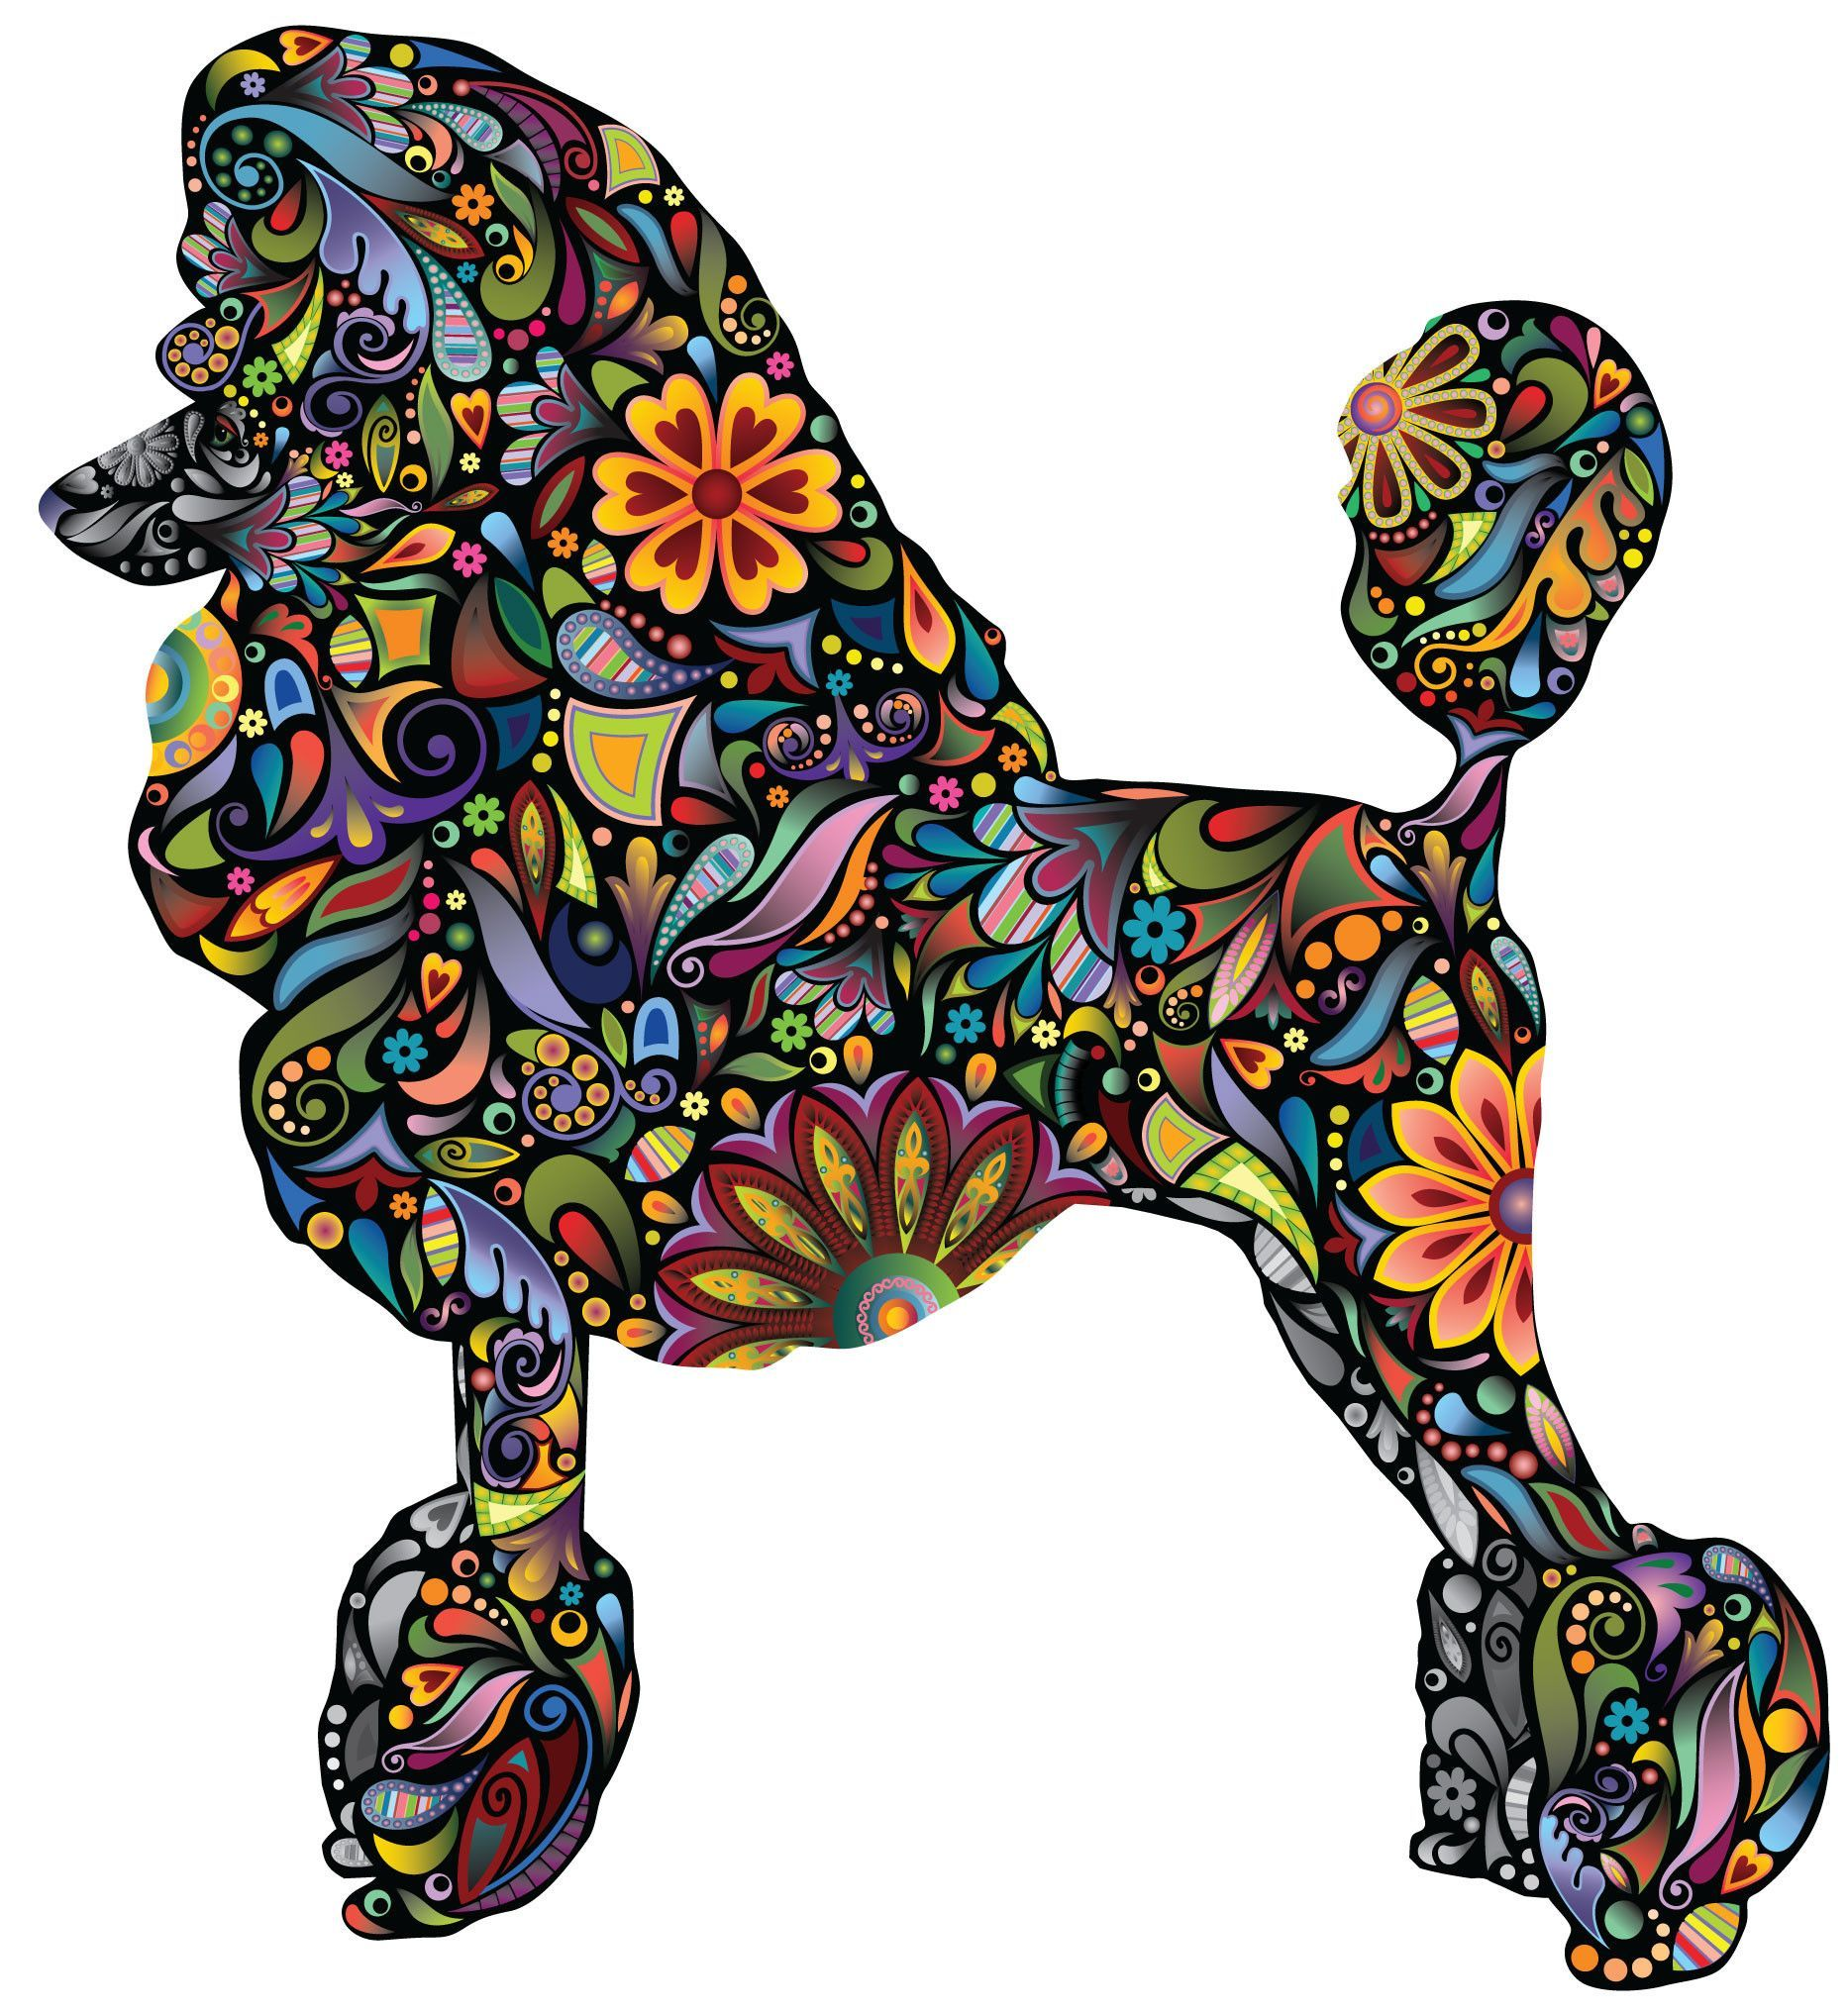 Standard Poodle Dog Decal Wall Sticker   Perros grandes, Riñonera y ...